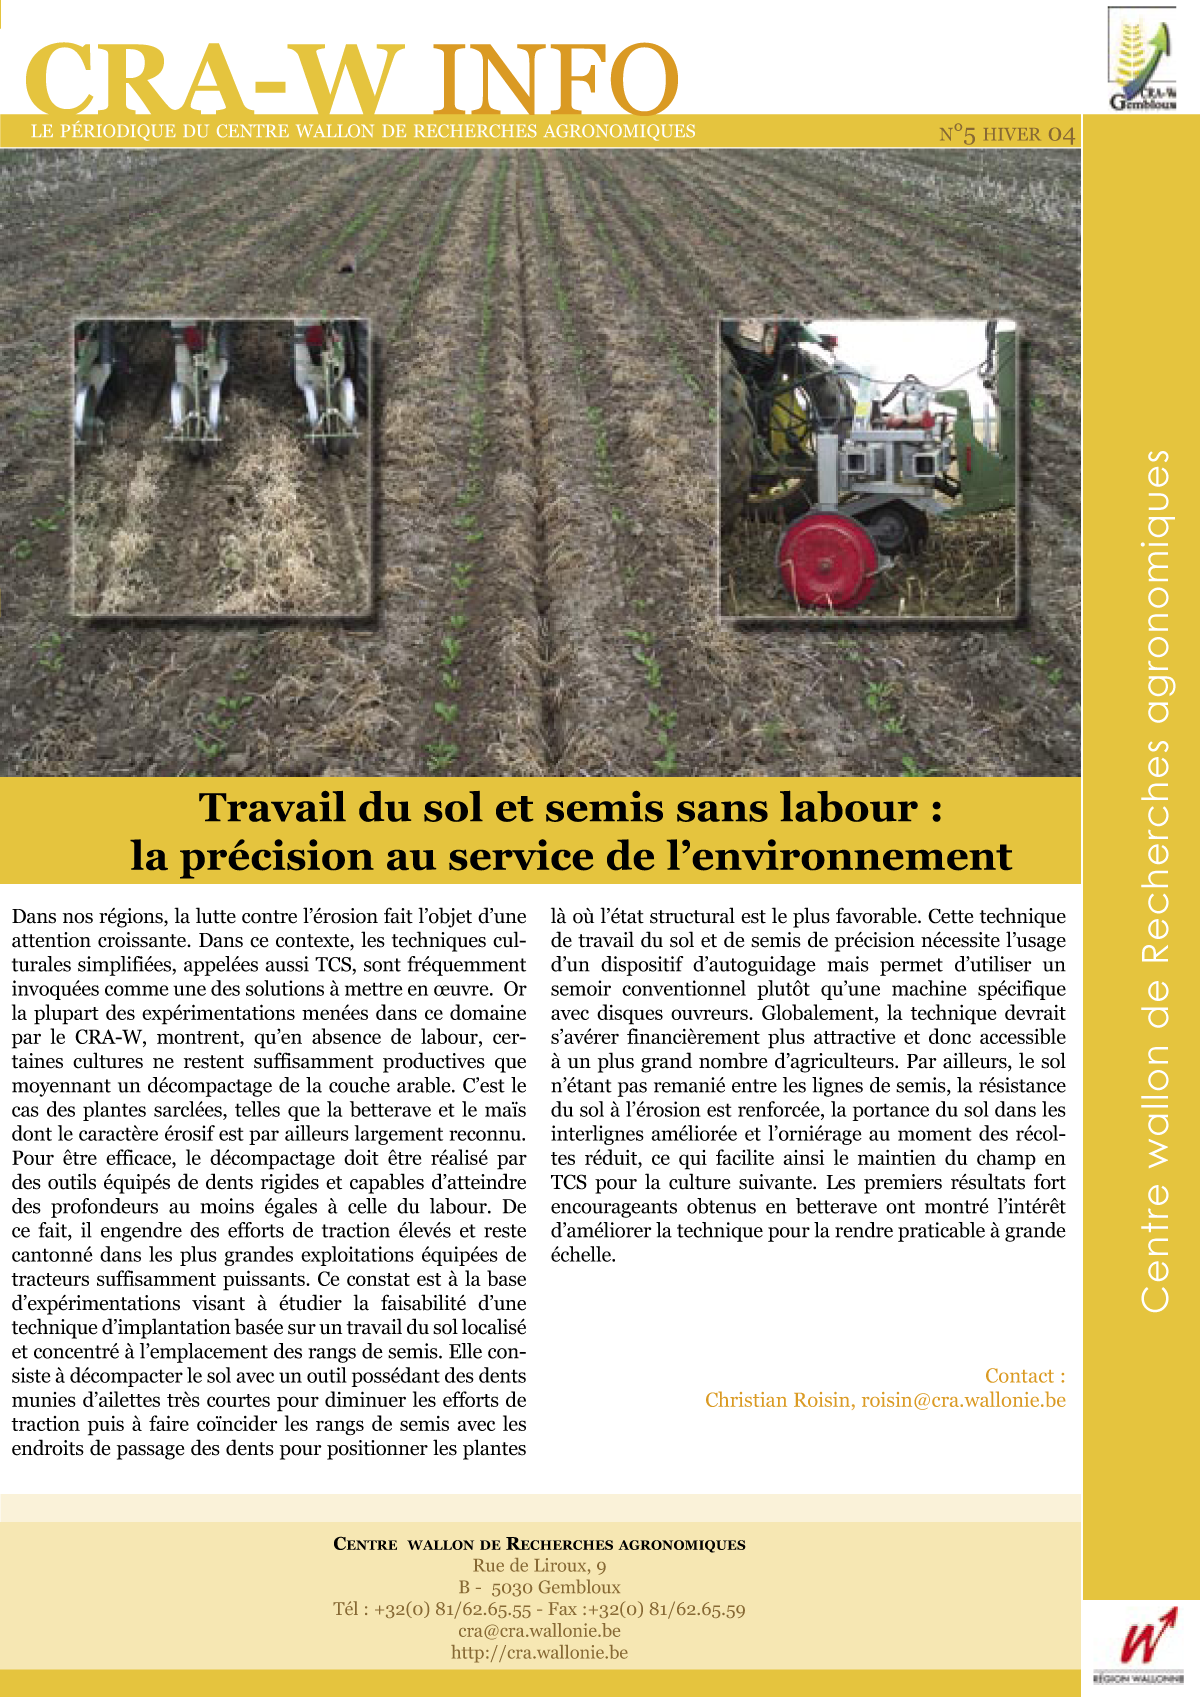 CRAW info n° 5